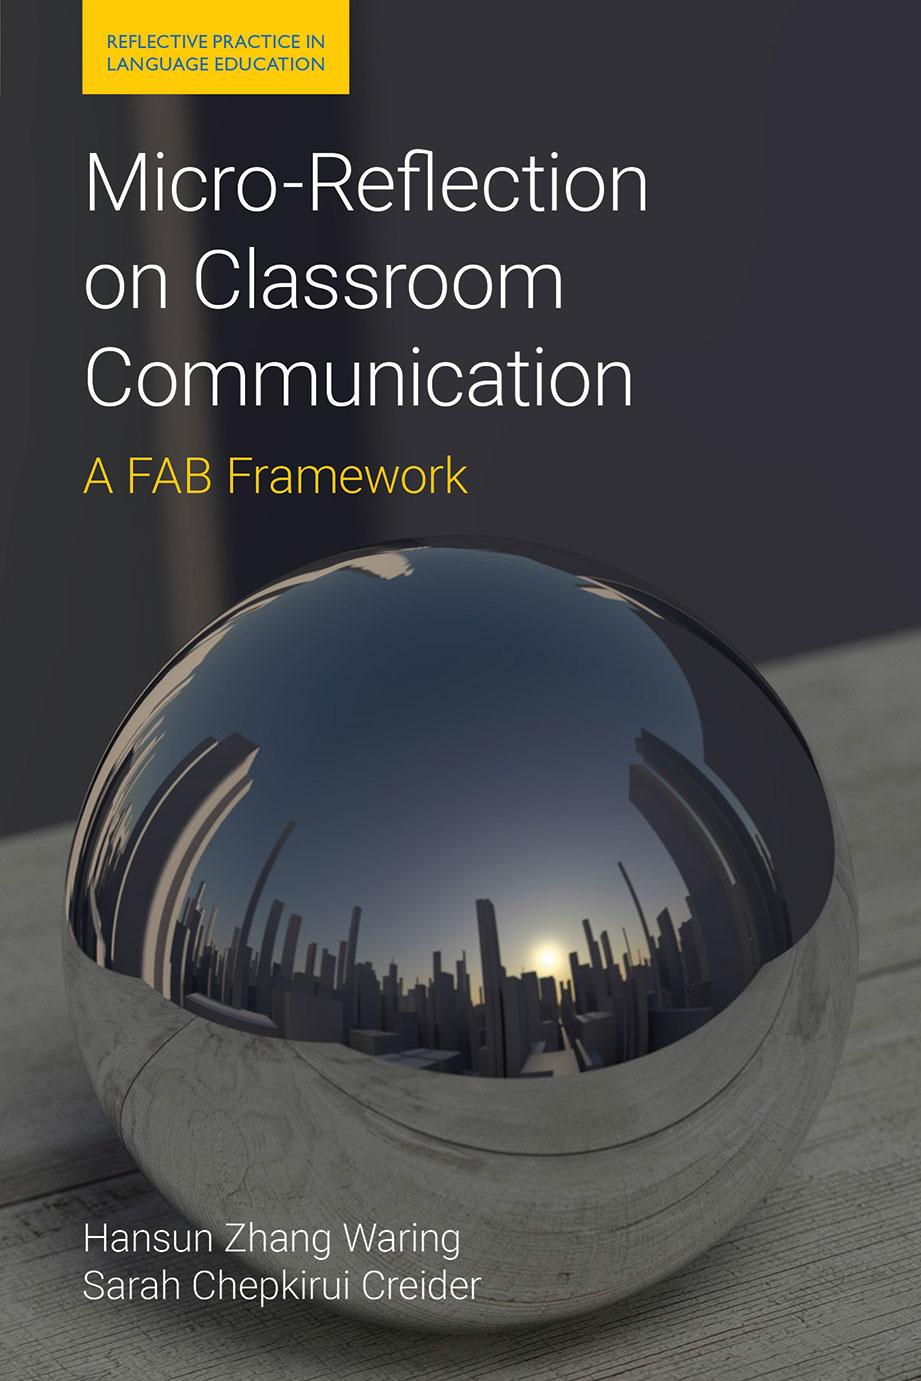 Micro-Reflection on Classroom Communication